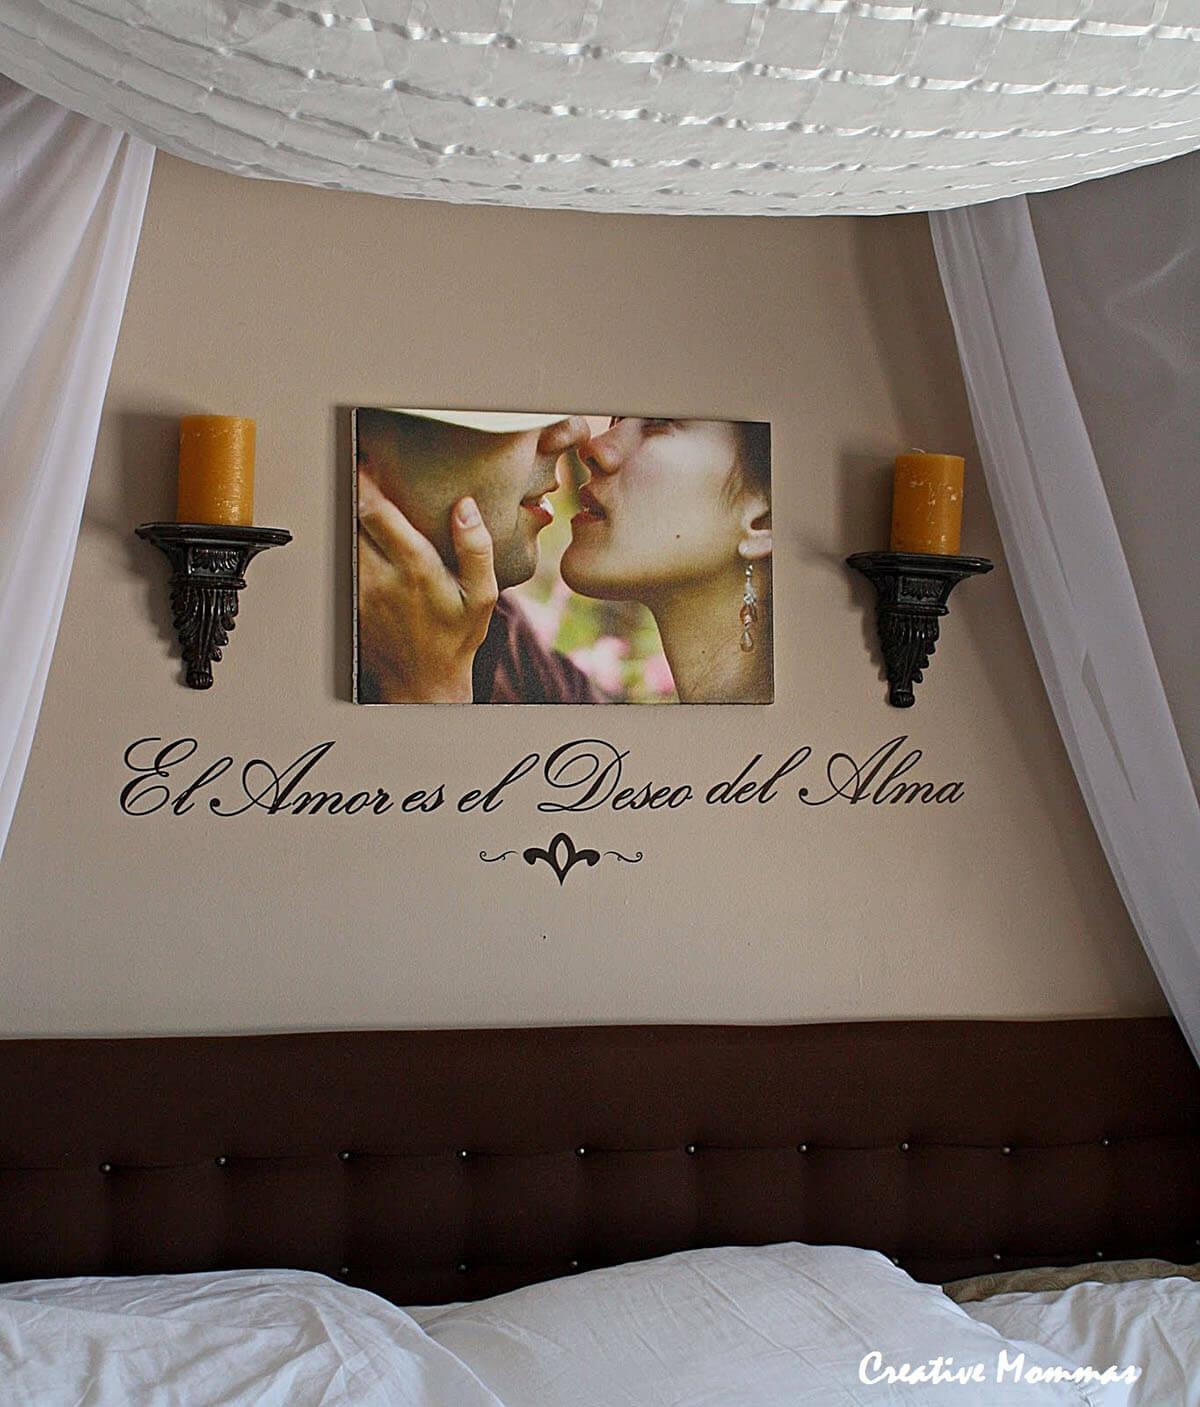 Soul's Desire Bedroom Design for Couples